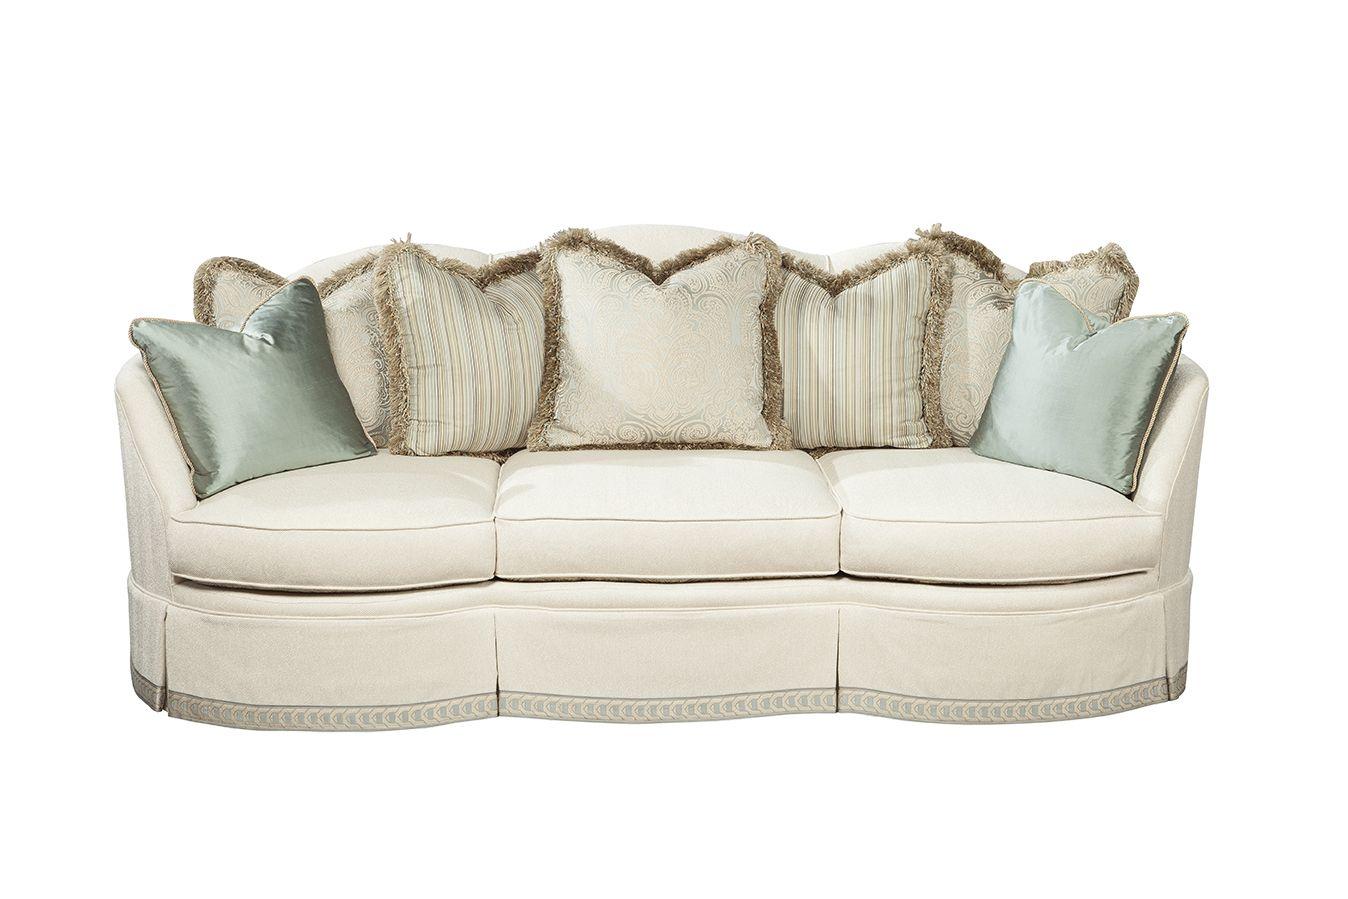 Delicieux Paladin Furniture 1255 92 Sofa